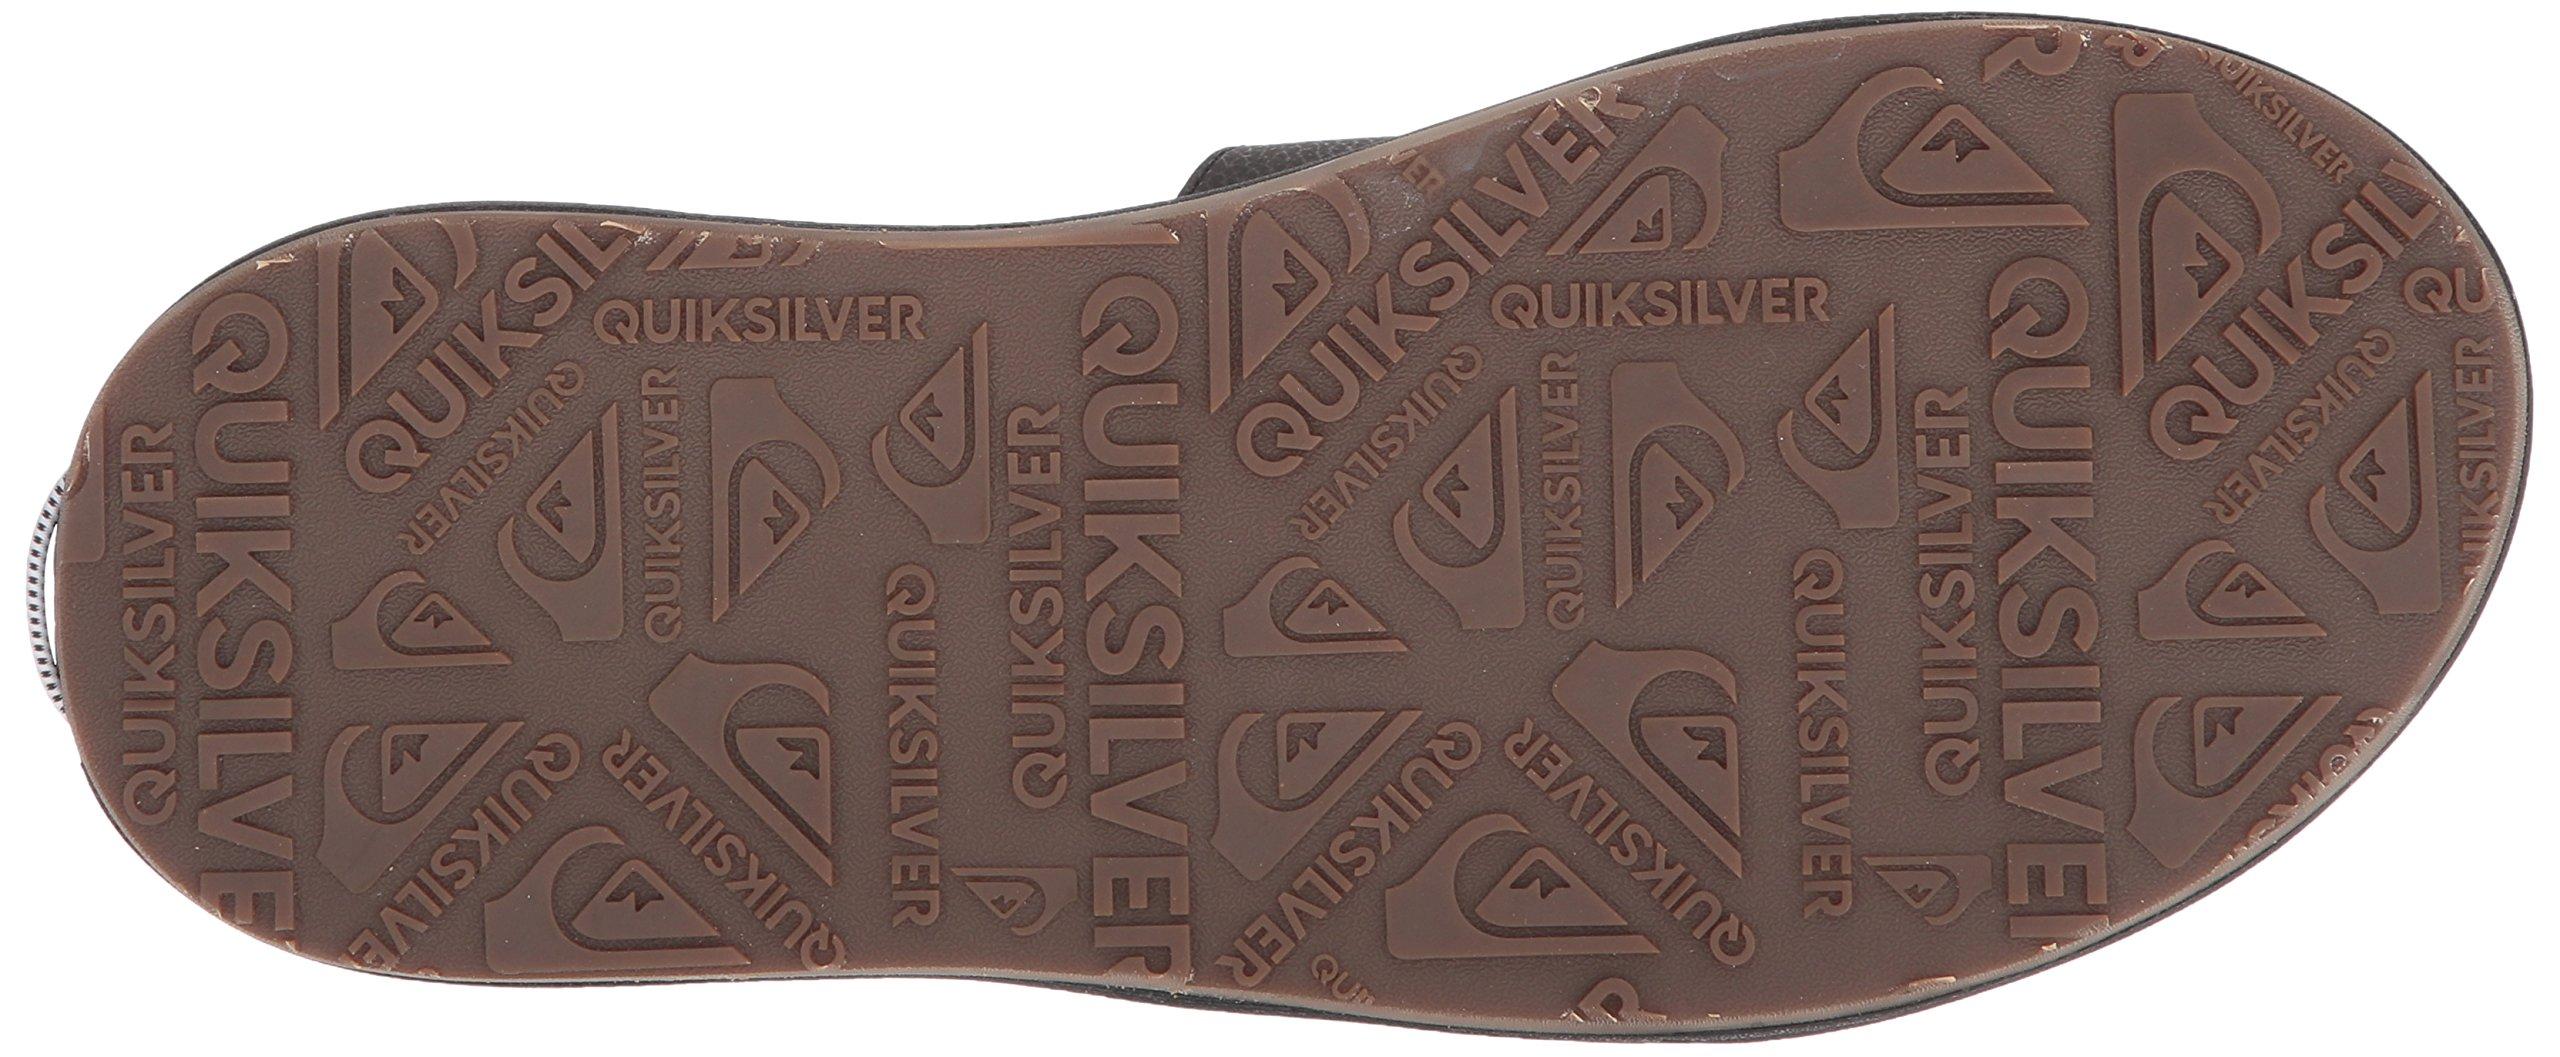 Quiksilver Men's Travel Oasis Slide Sandal, Black/Black/Brown, 8(41) M US by Quiksilver (Image #3)